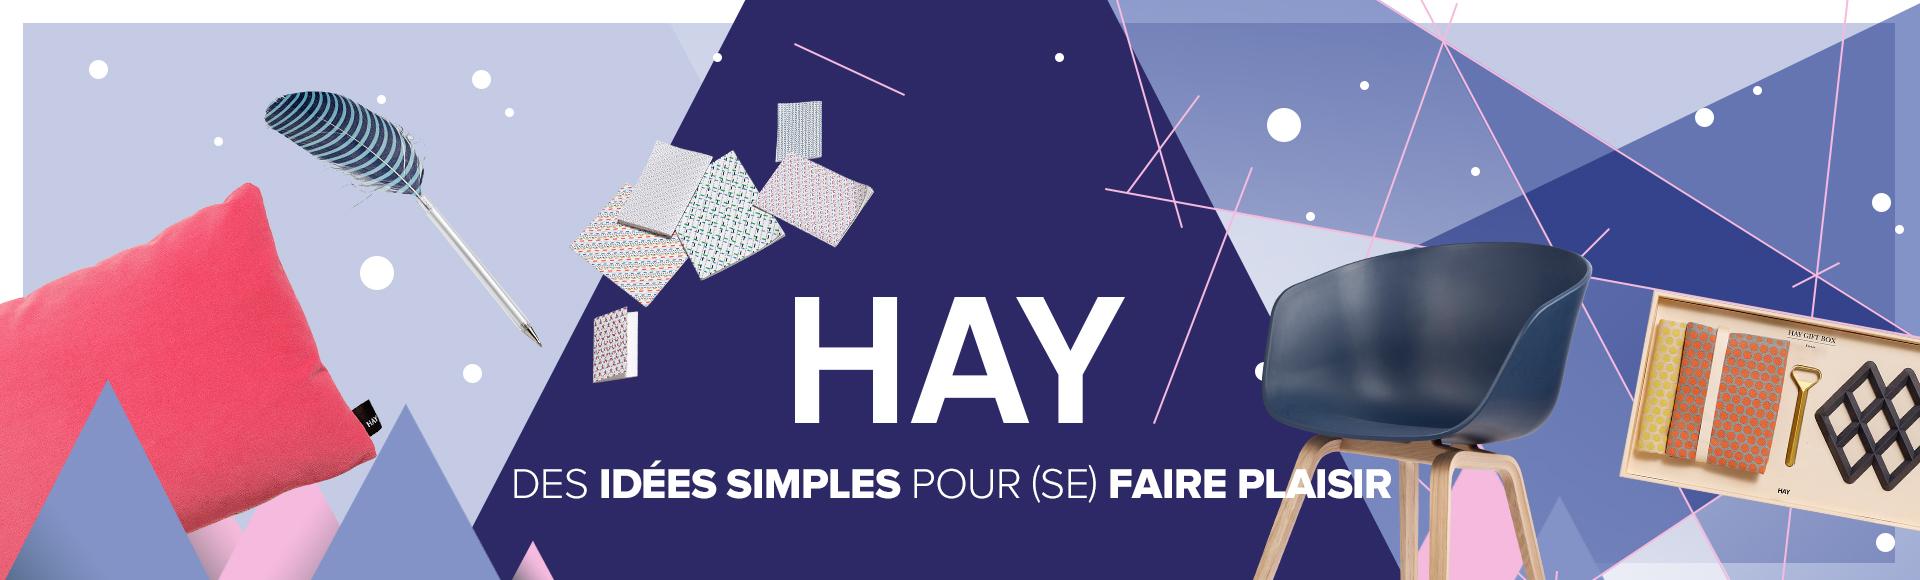 Slider - Web - Hay.jpg